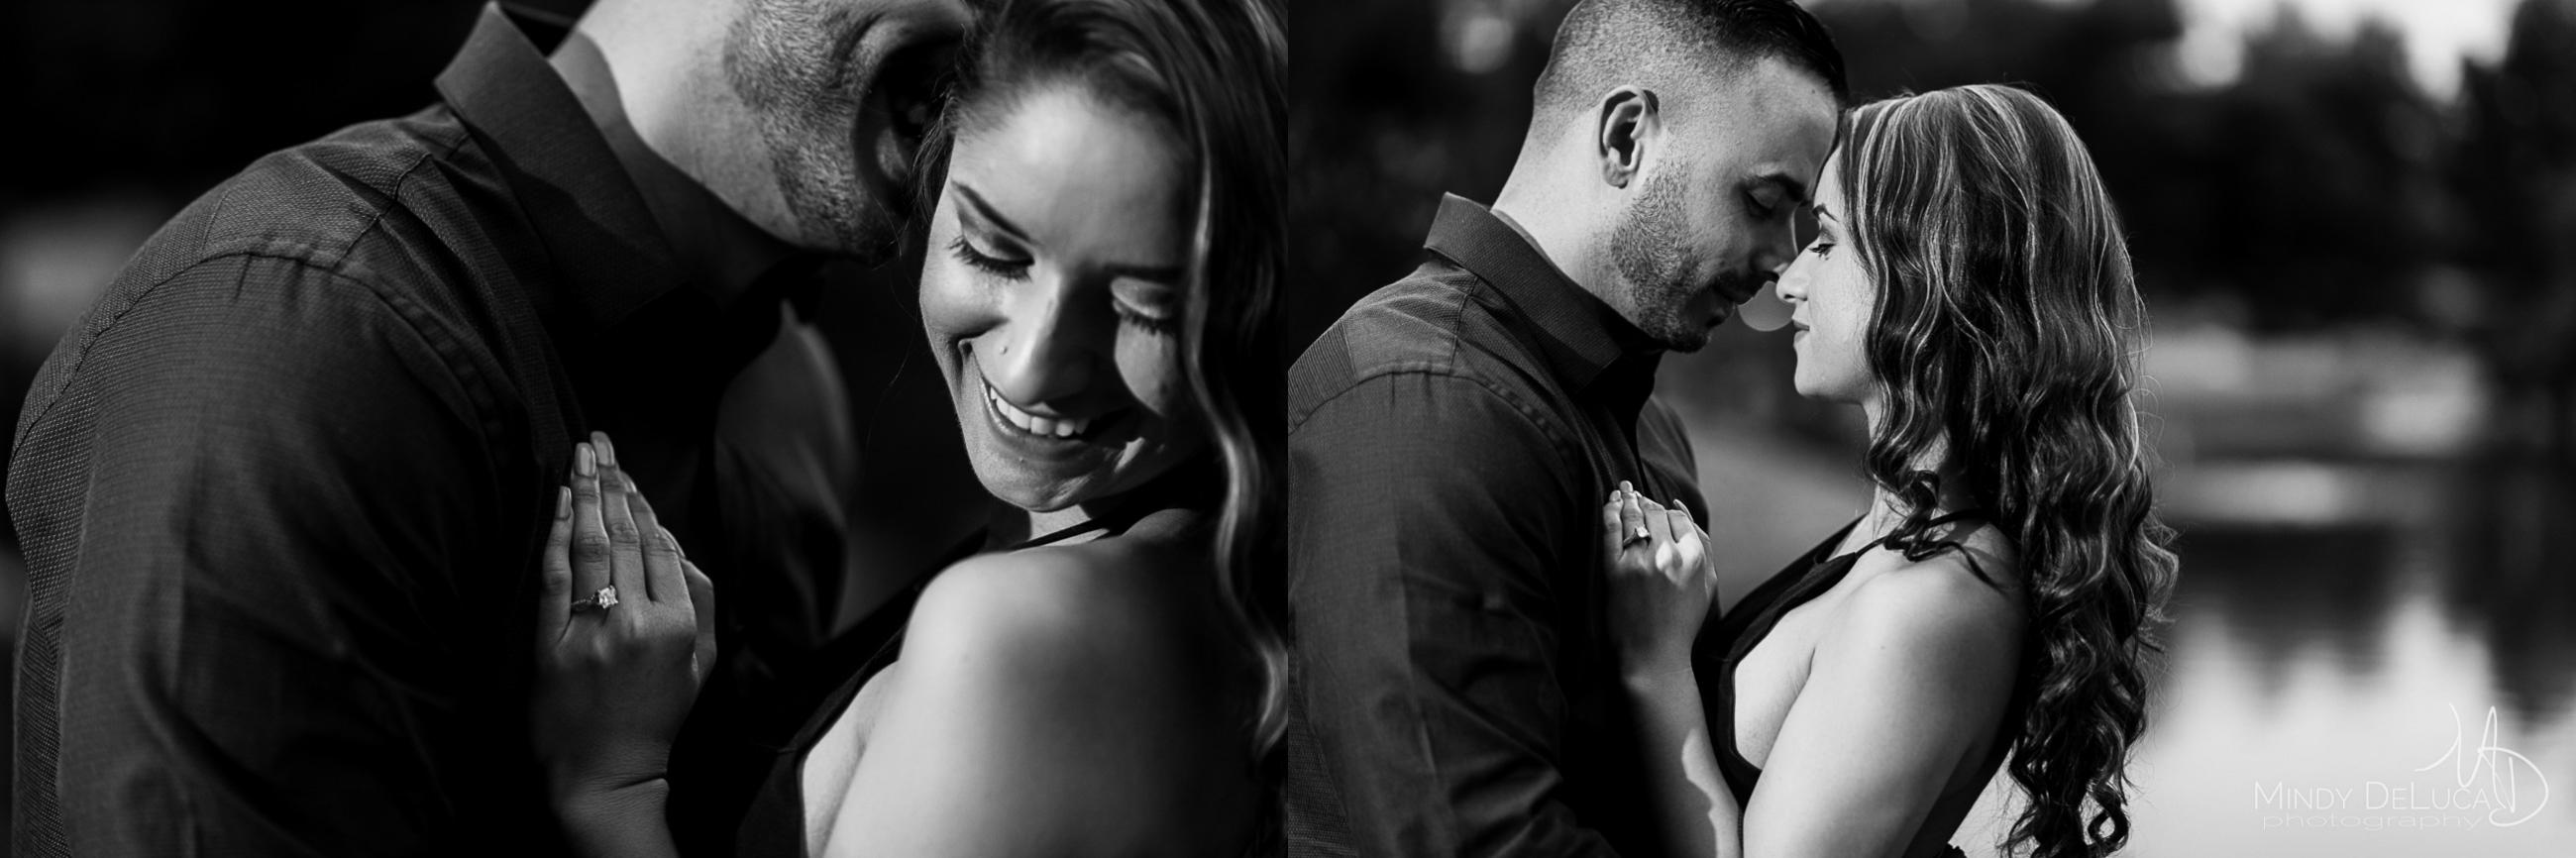 Romantic black & white engagement photos